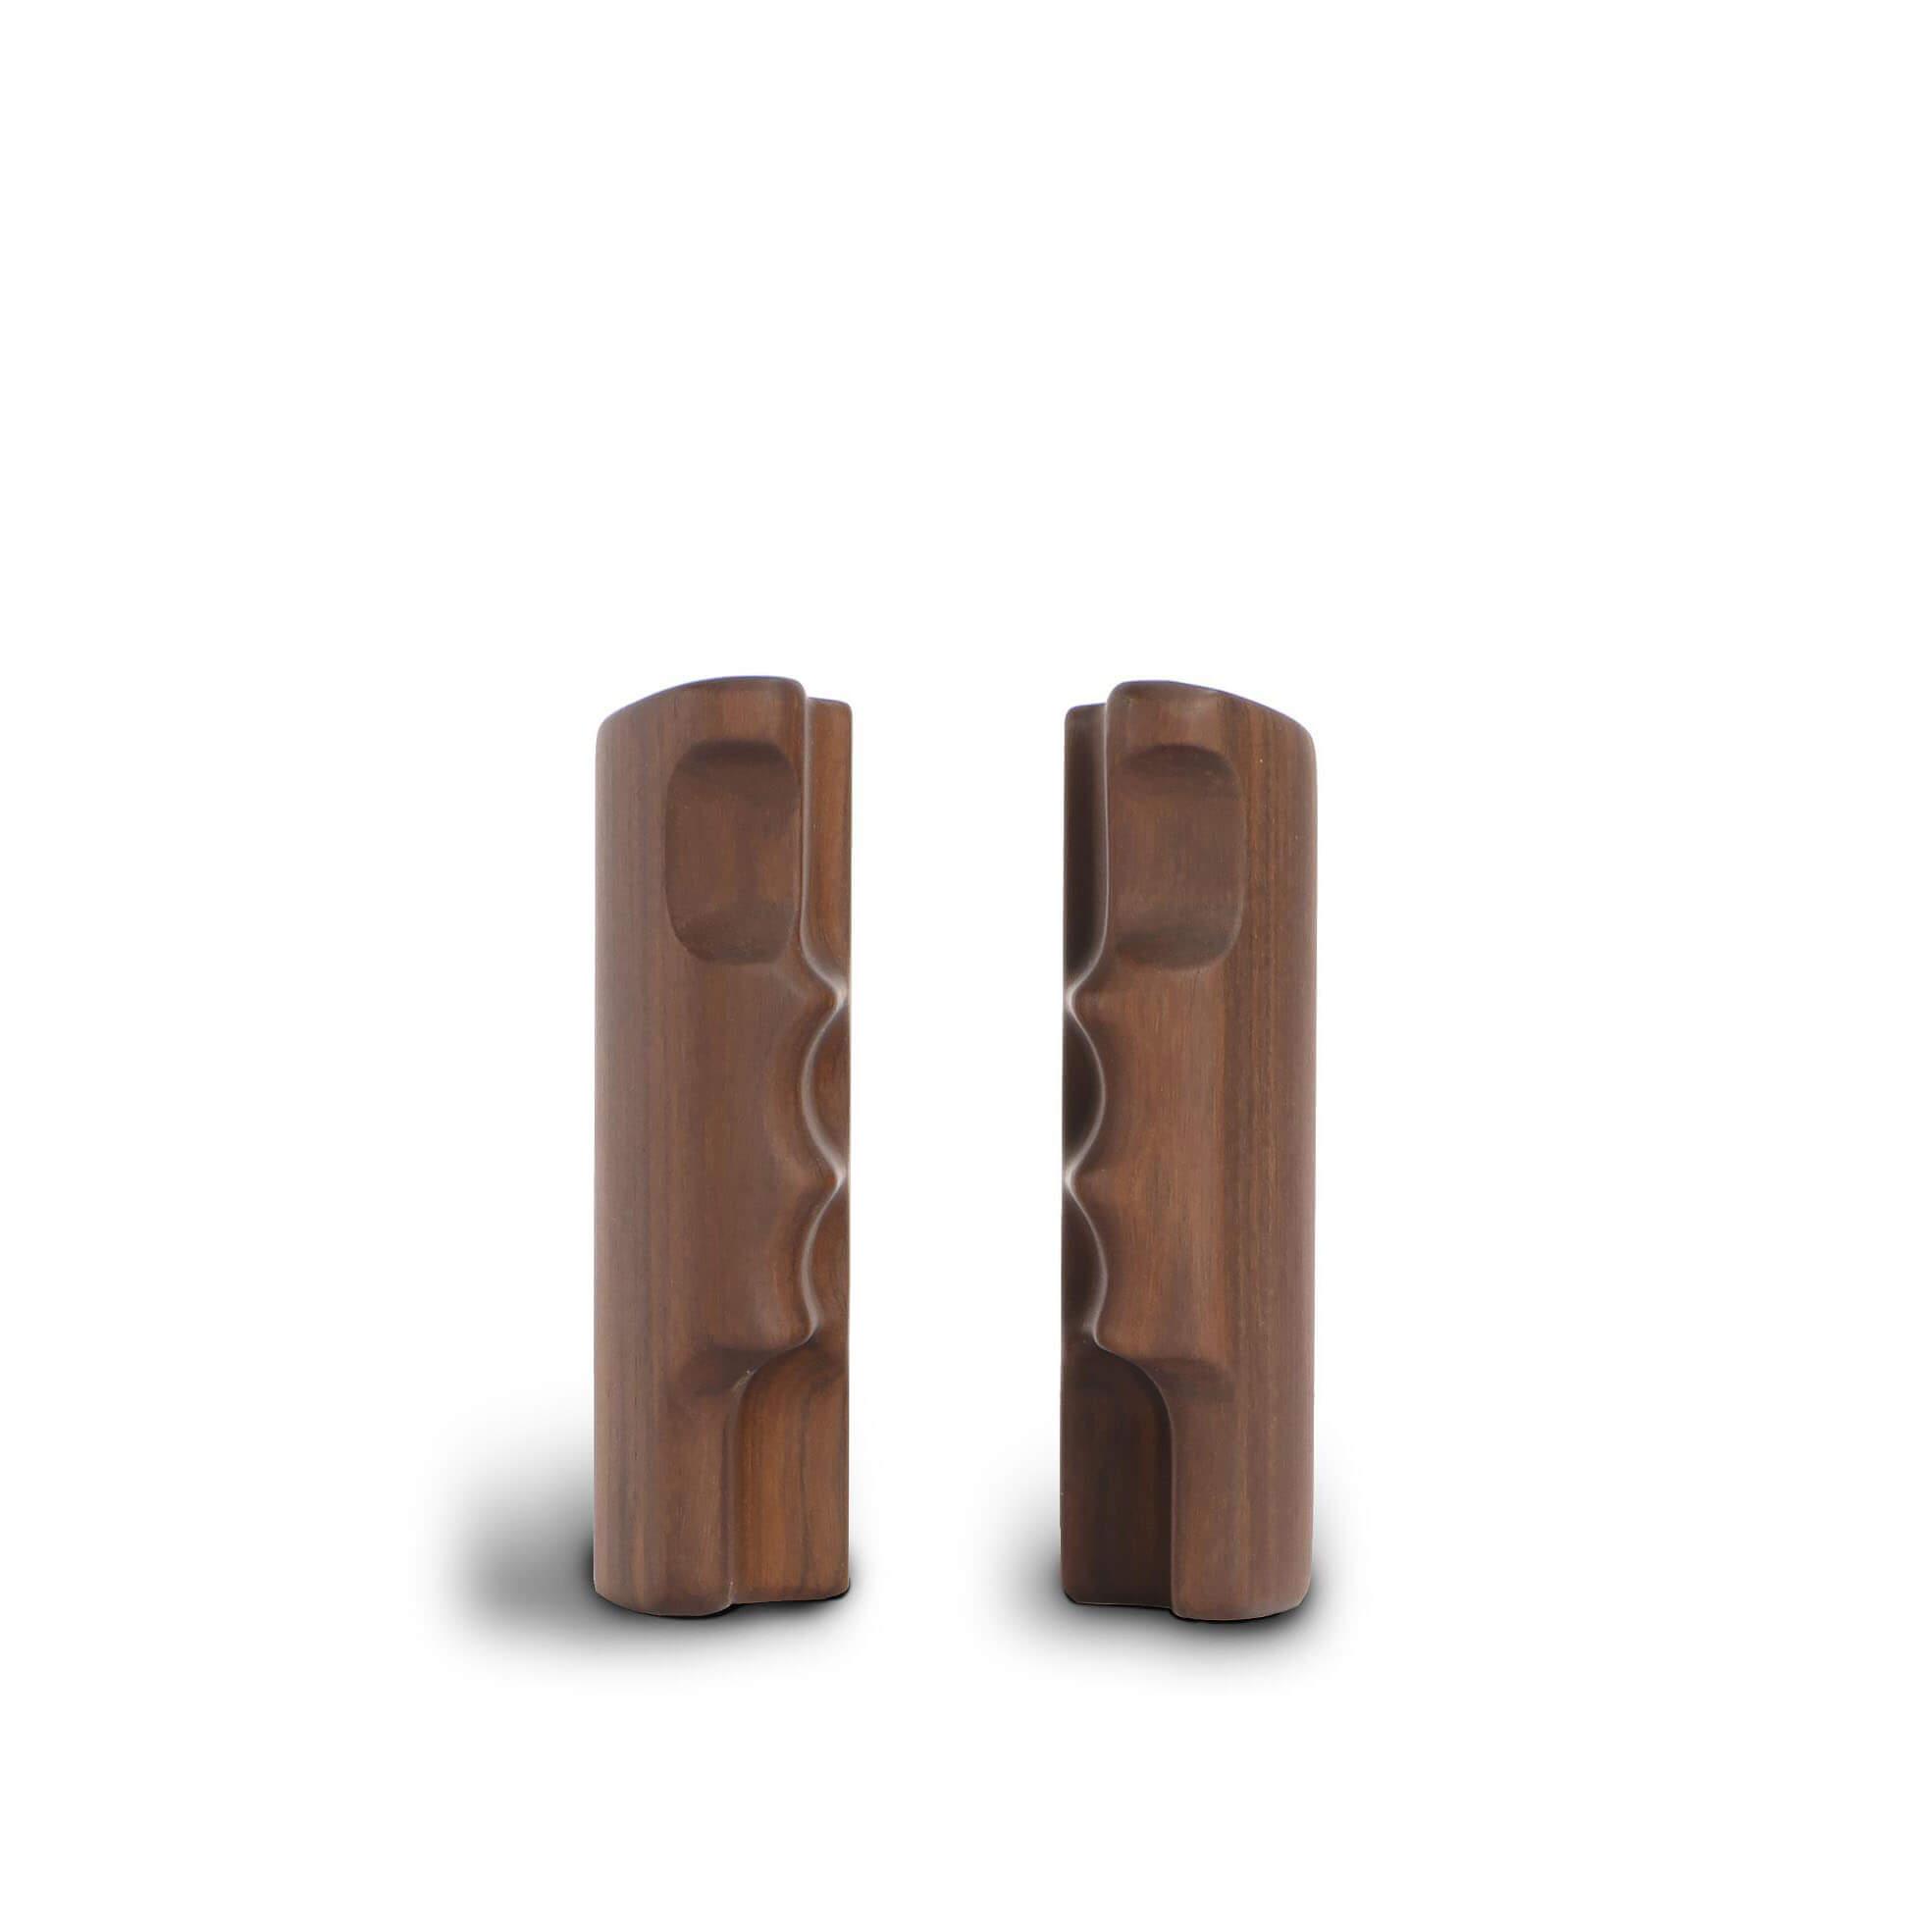 ALPA Wooden Handgrips